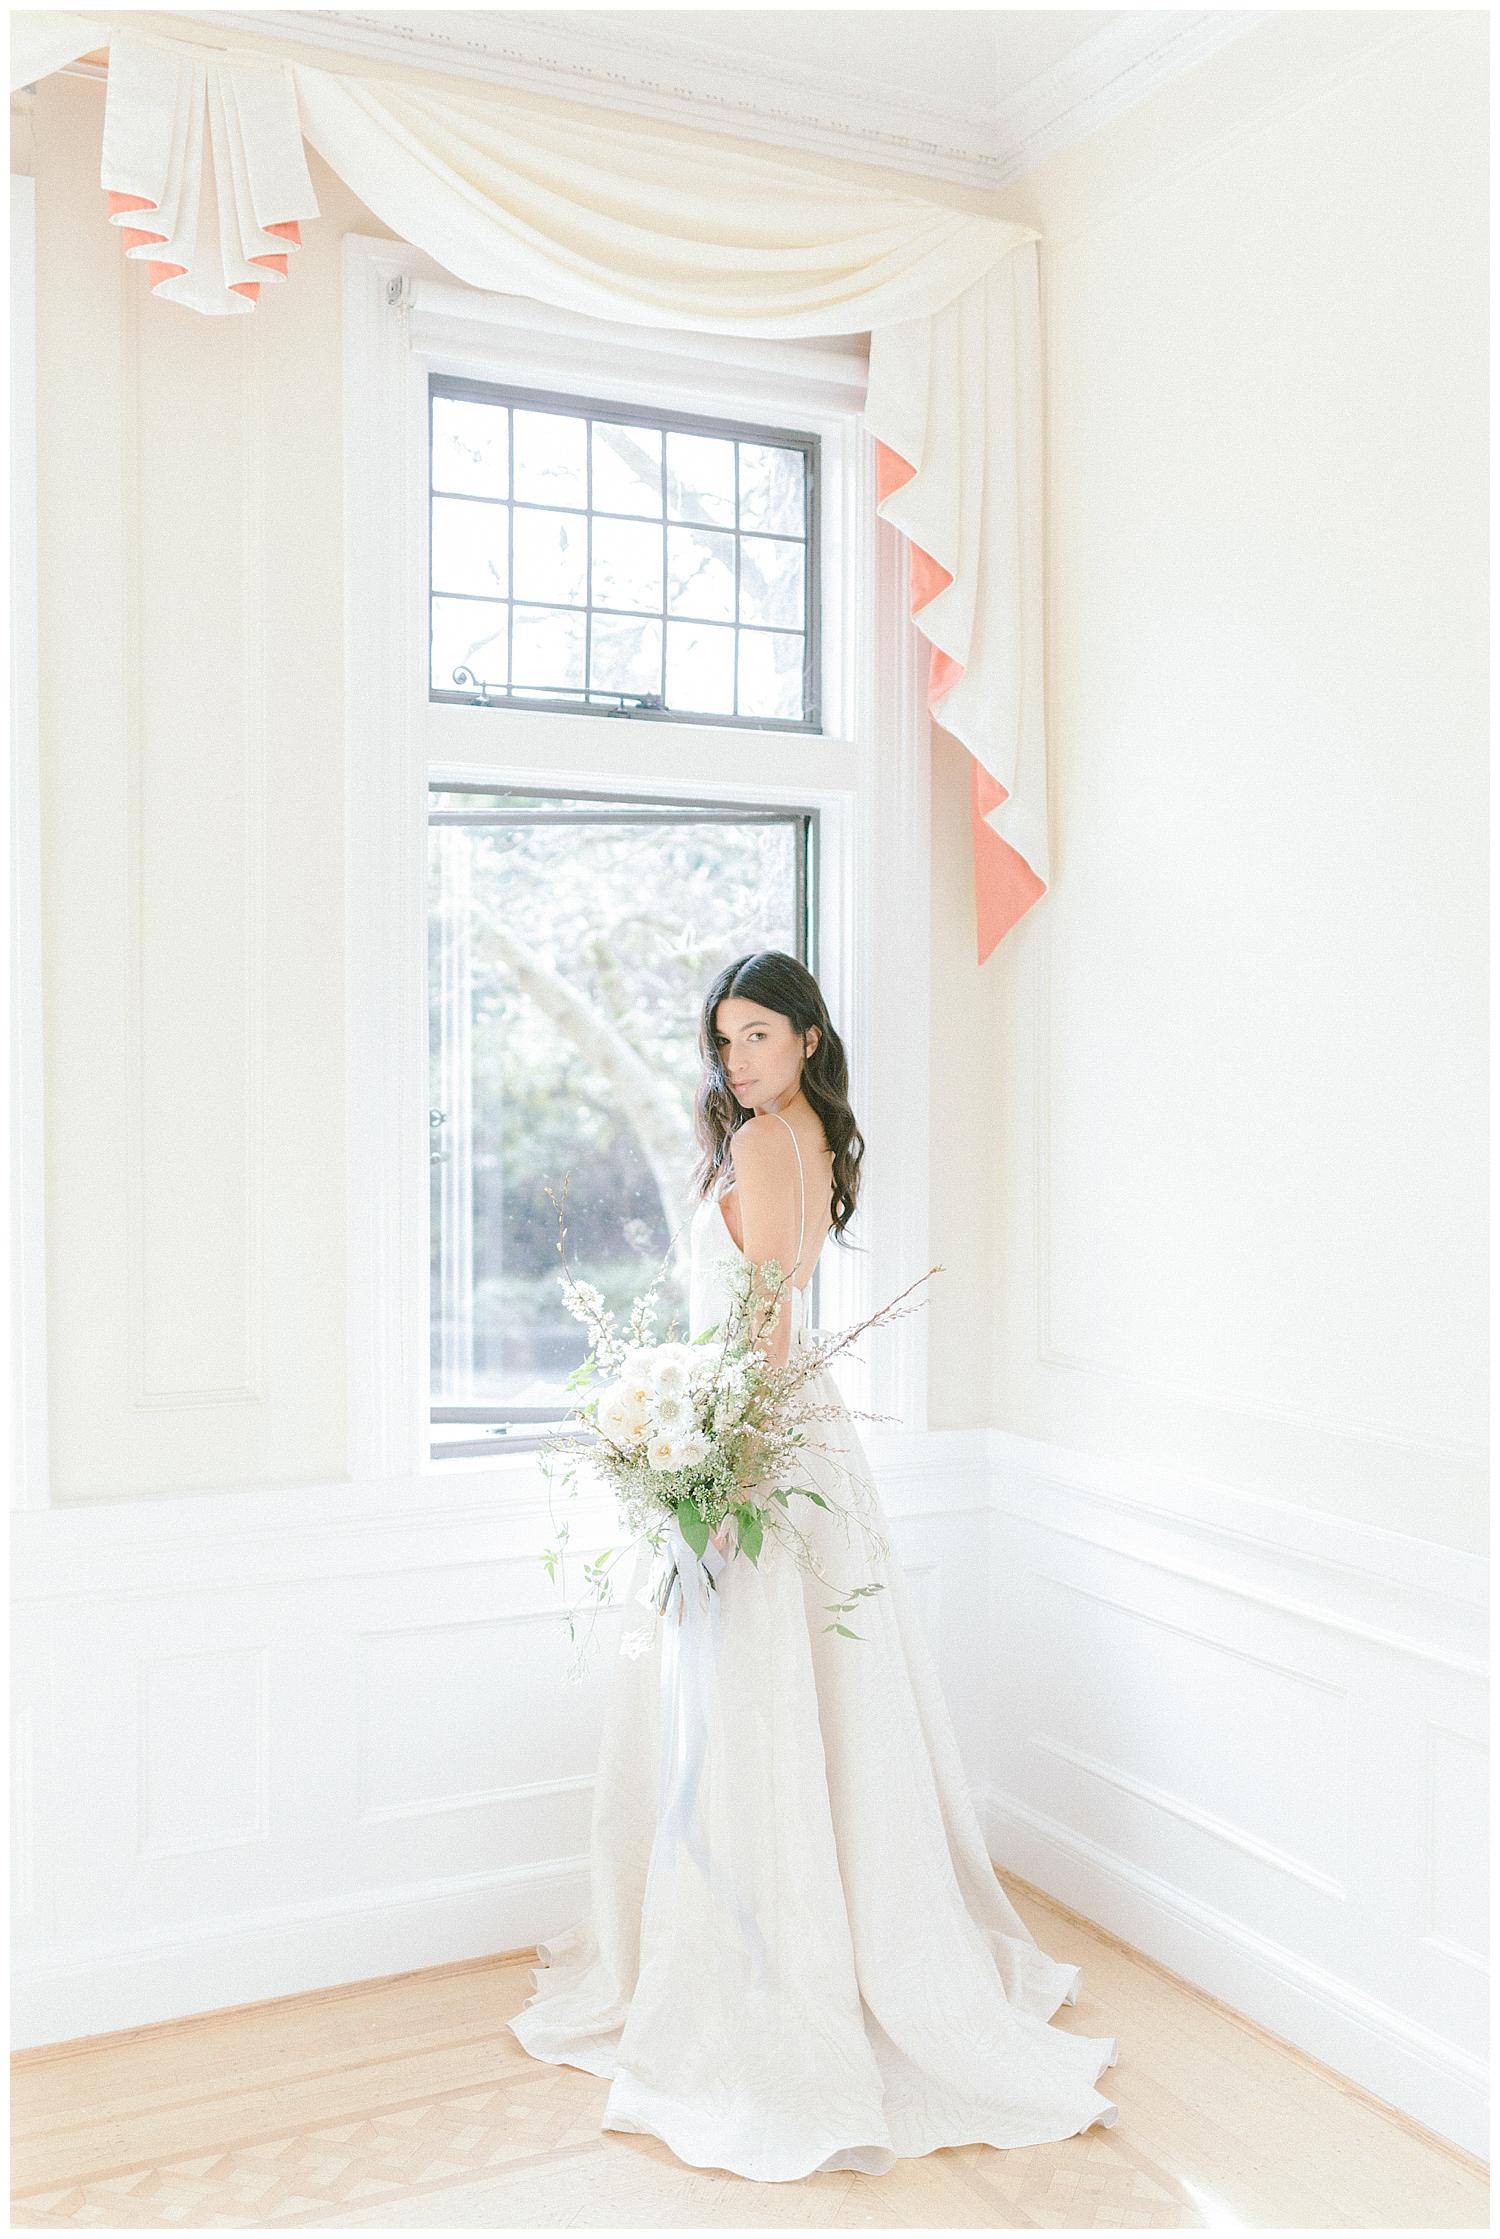 Hong Kong Vancouver fine art prewedding wedding photography photographer00012.jpg